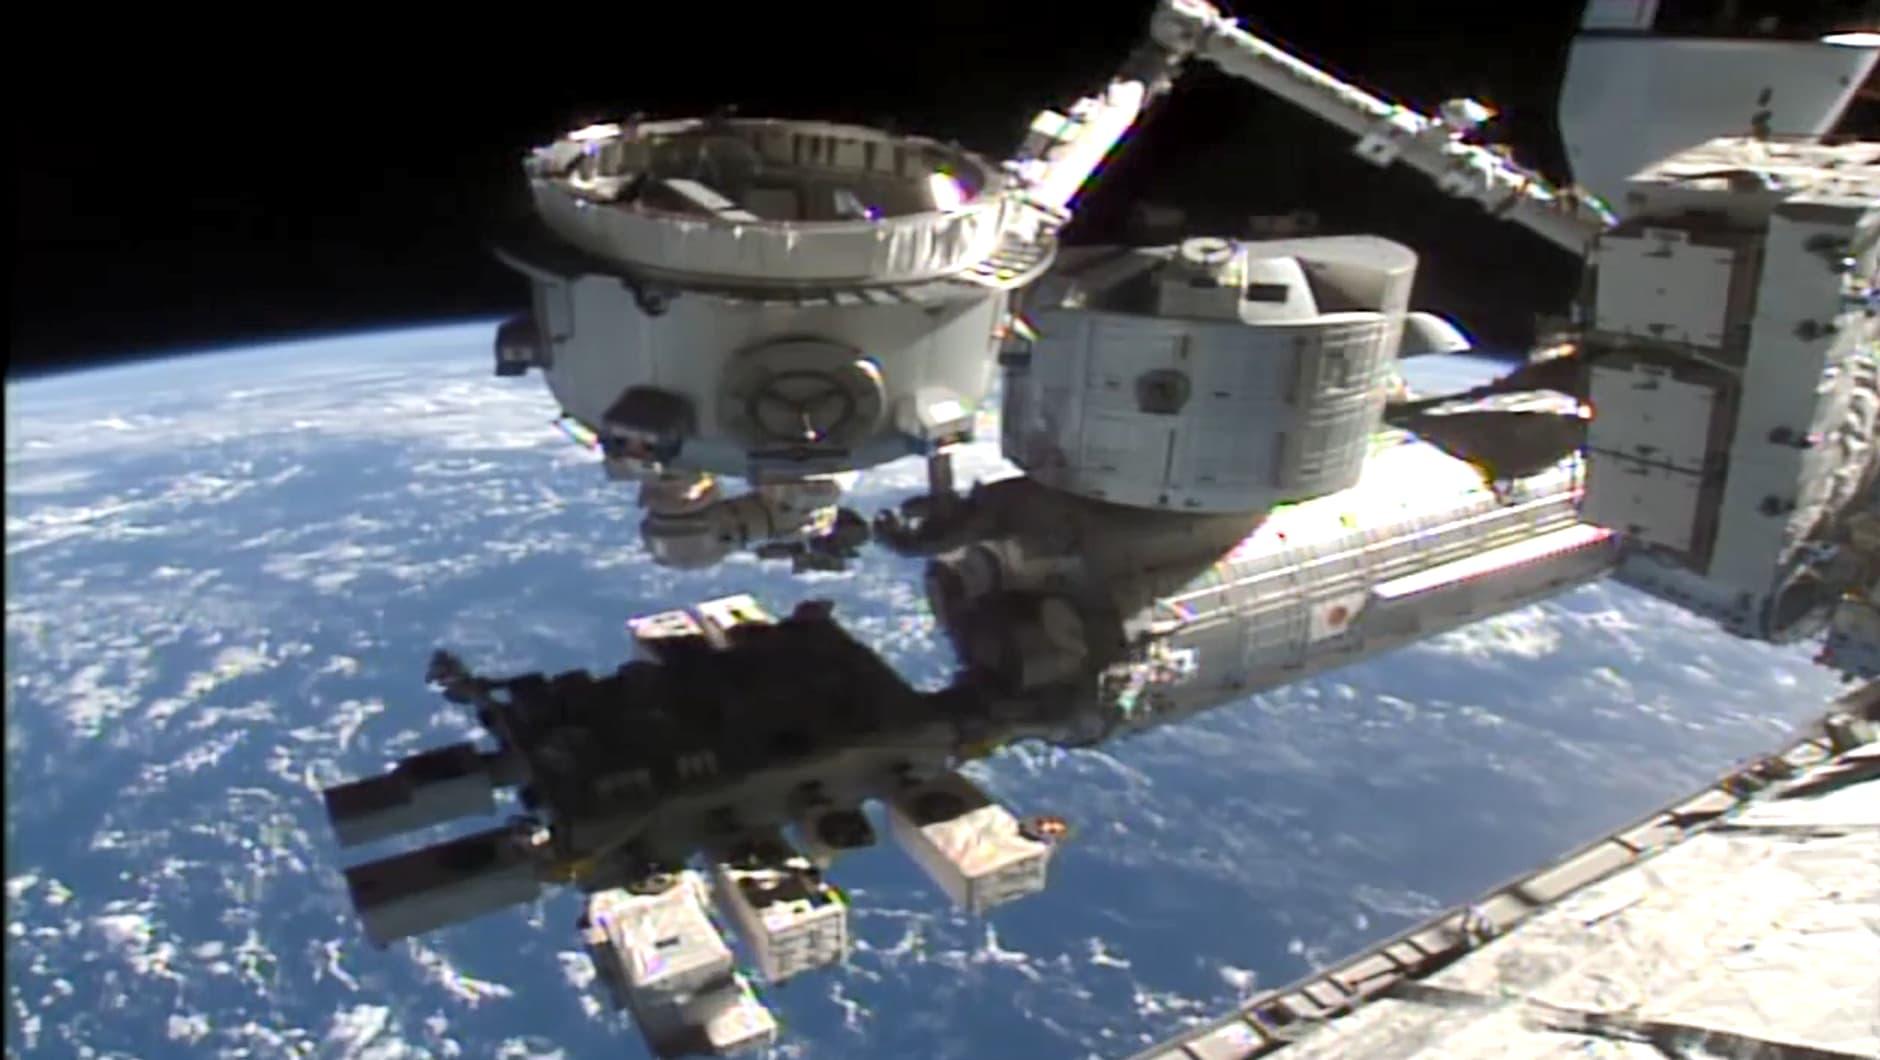 voyager-space-holdings-takes-majority-stake-in-nanoracks-xo-markets